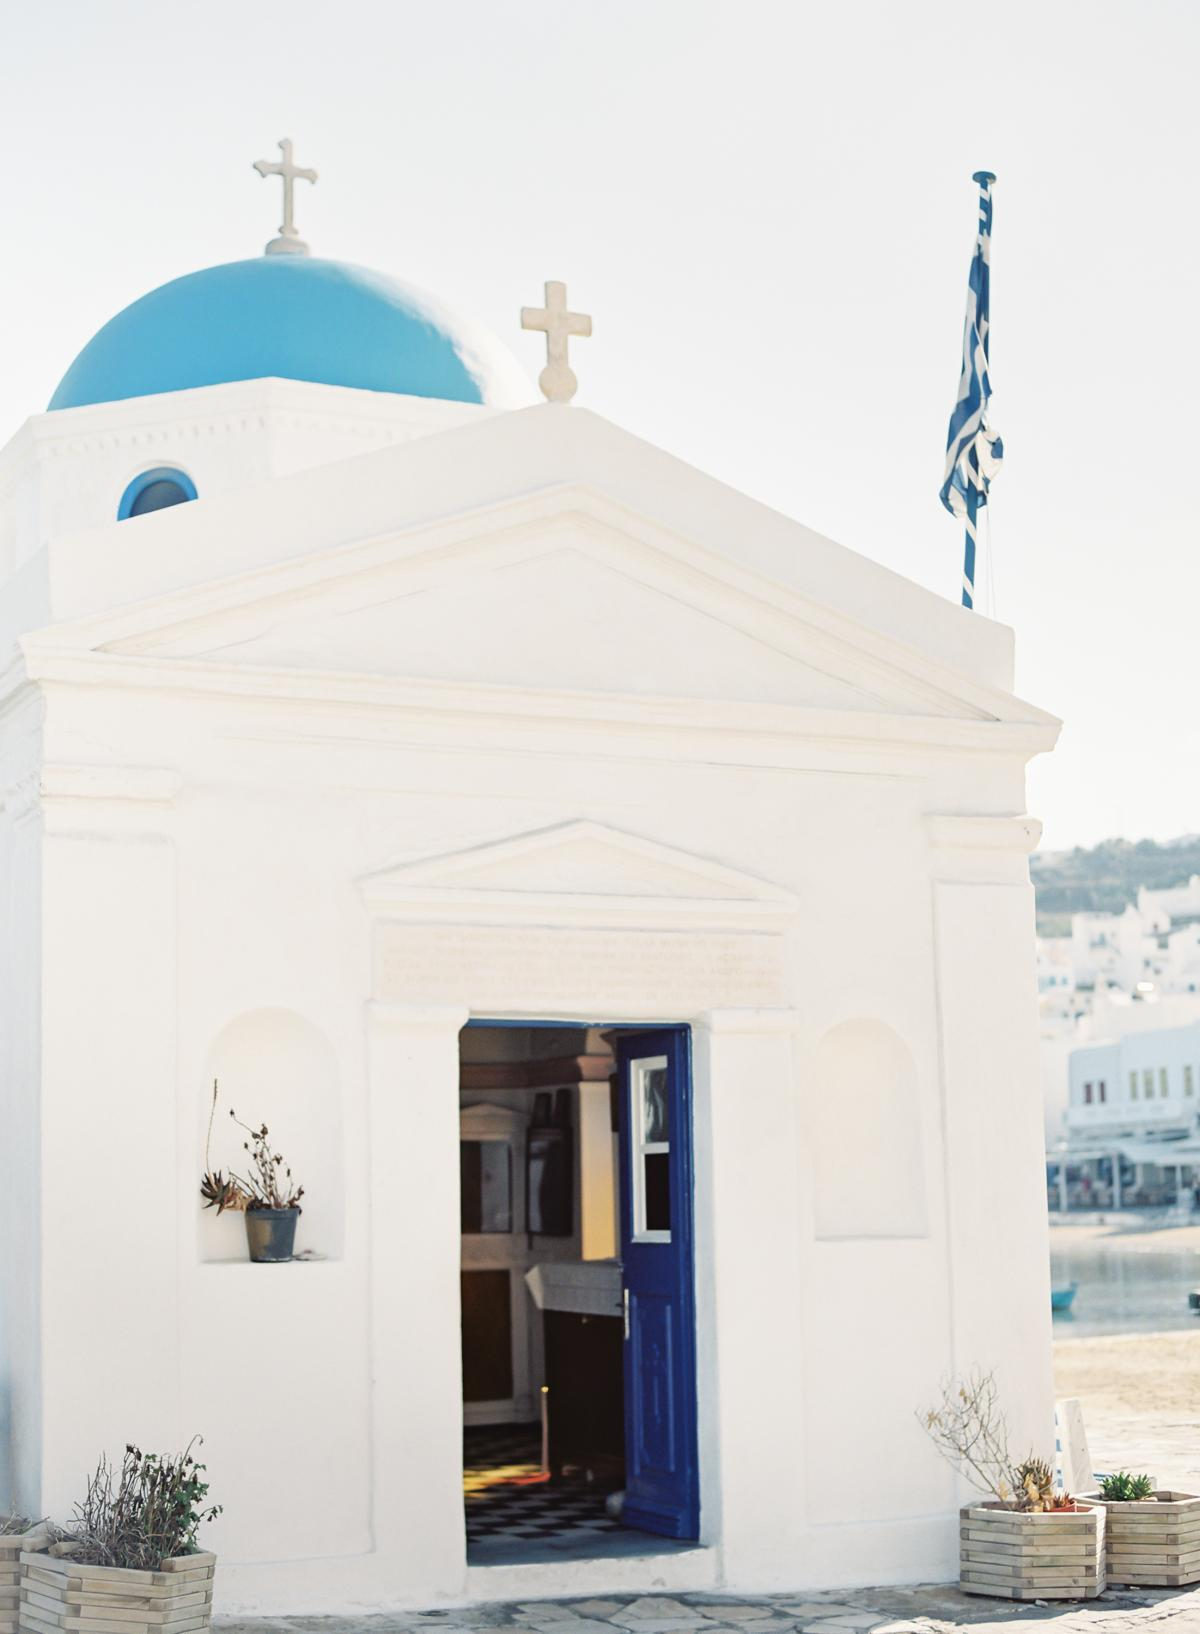 Mykonos greece travel photos by omalley photographers 0005 0004